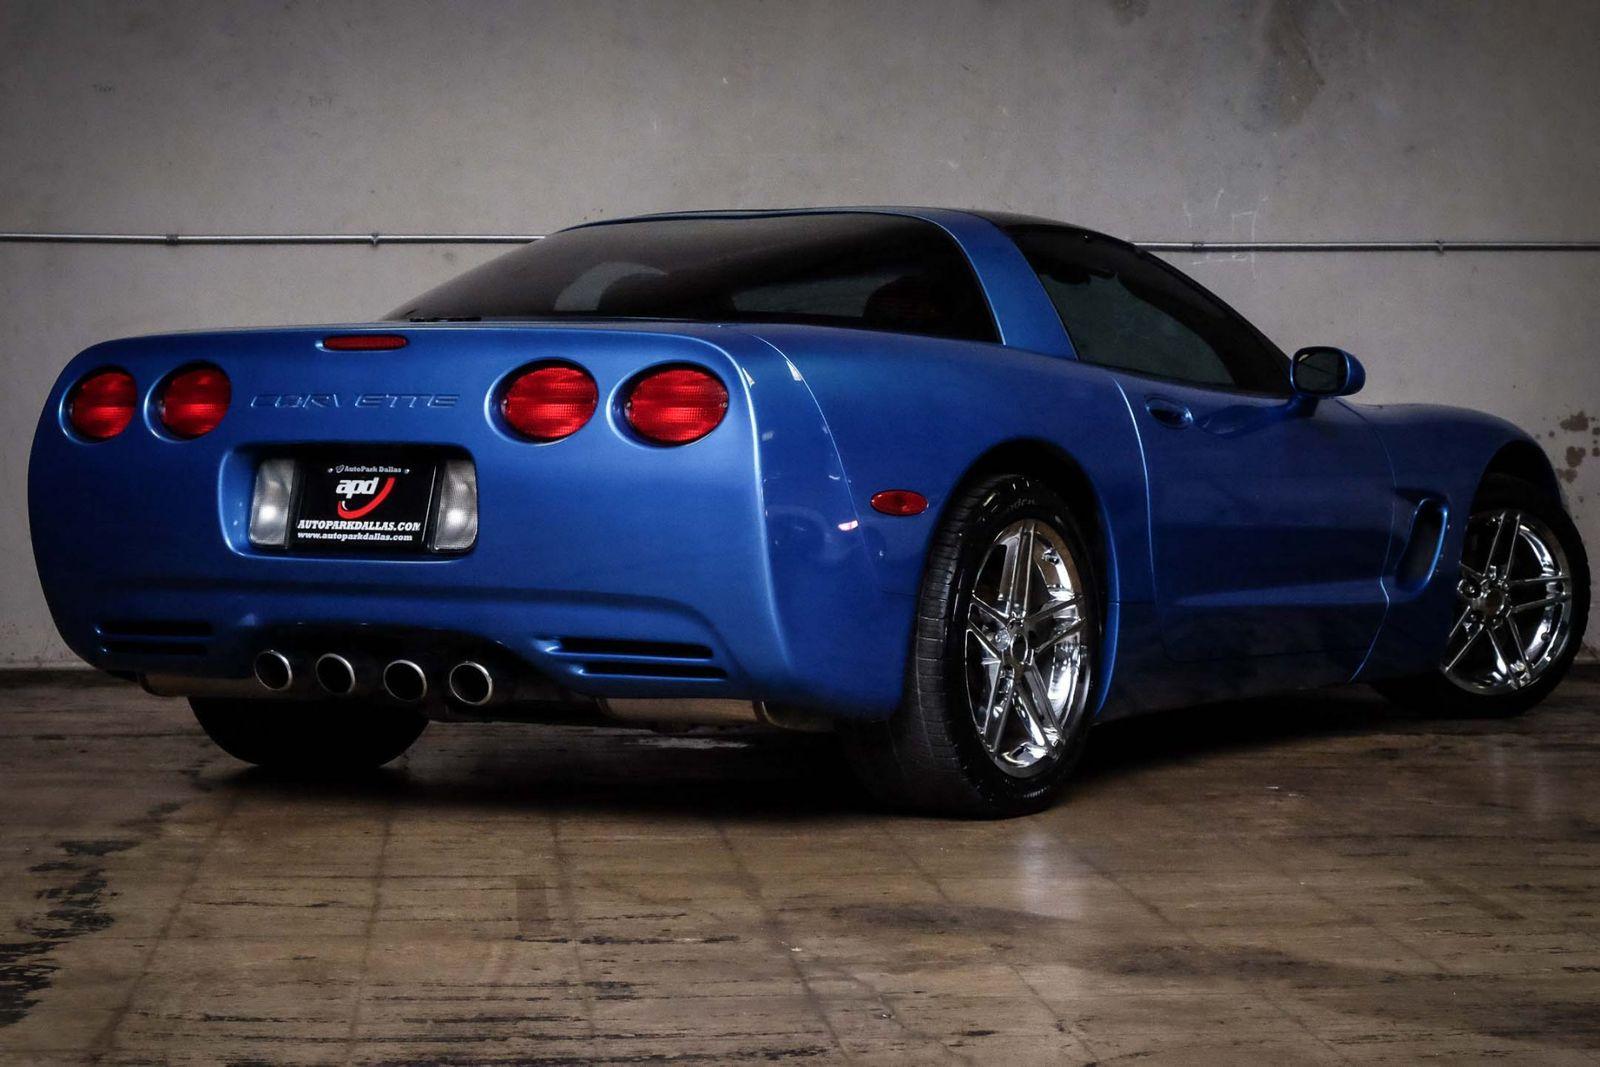 2000 Blue Chevrolet Corvette   | C5 Corvette Photo 6